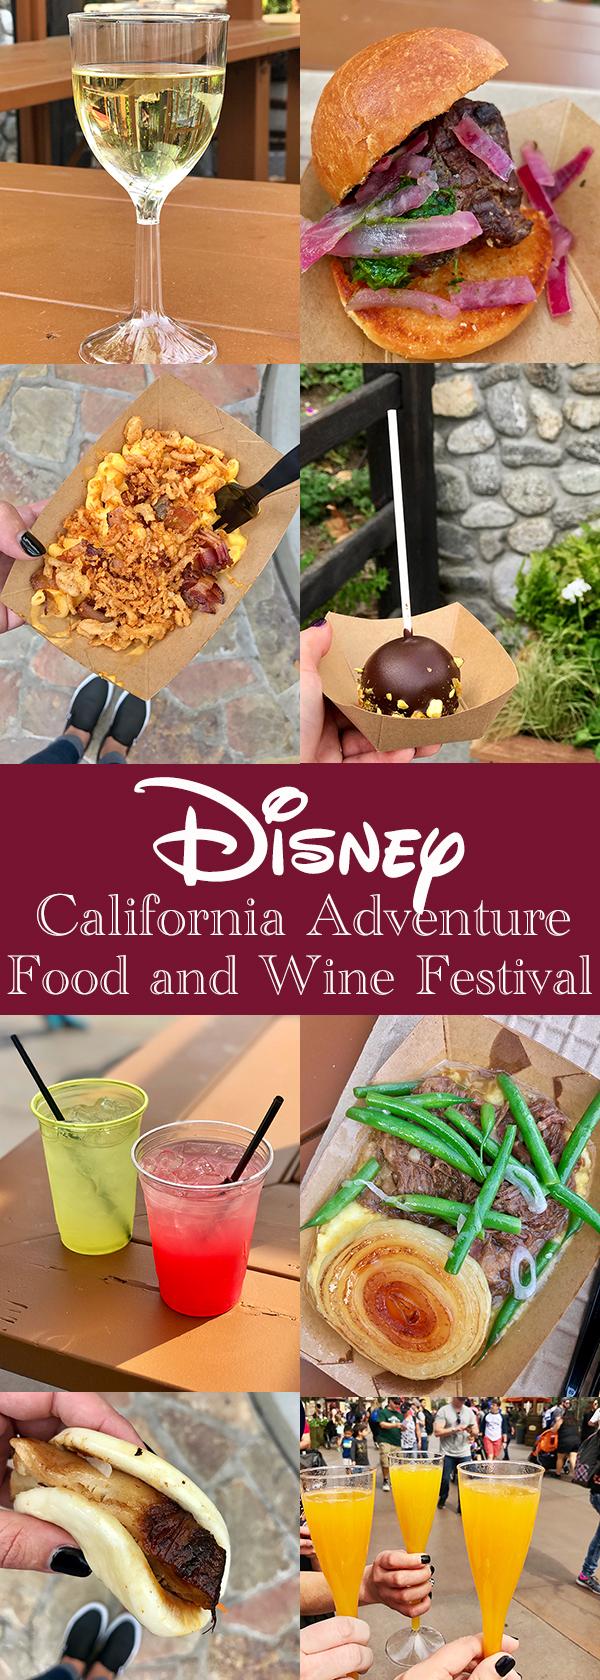 Disney California Adventure Food and Wine Festival